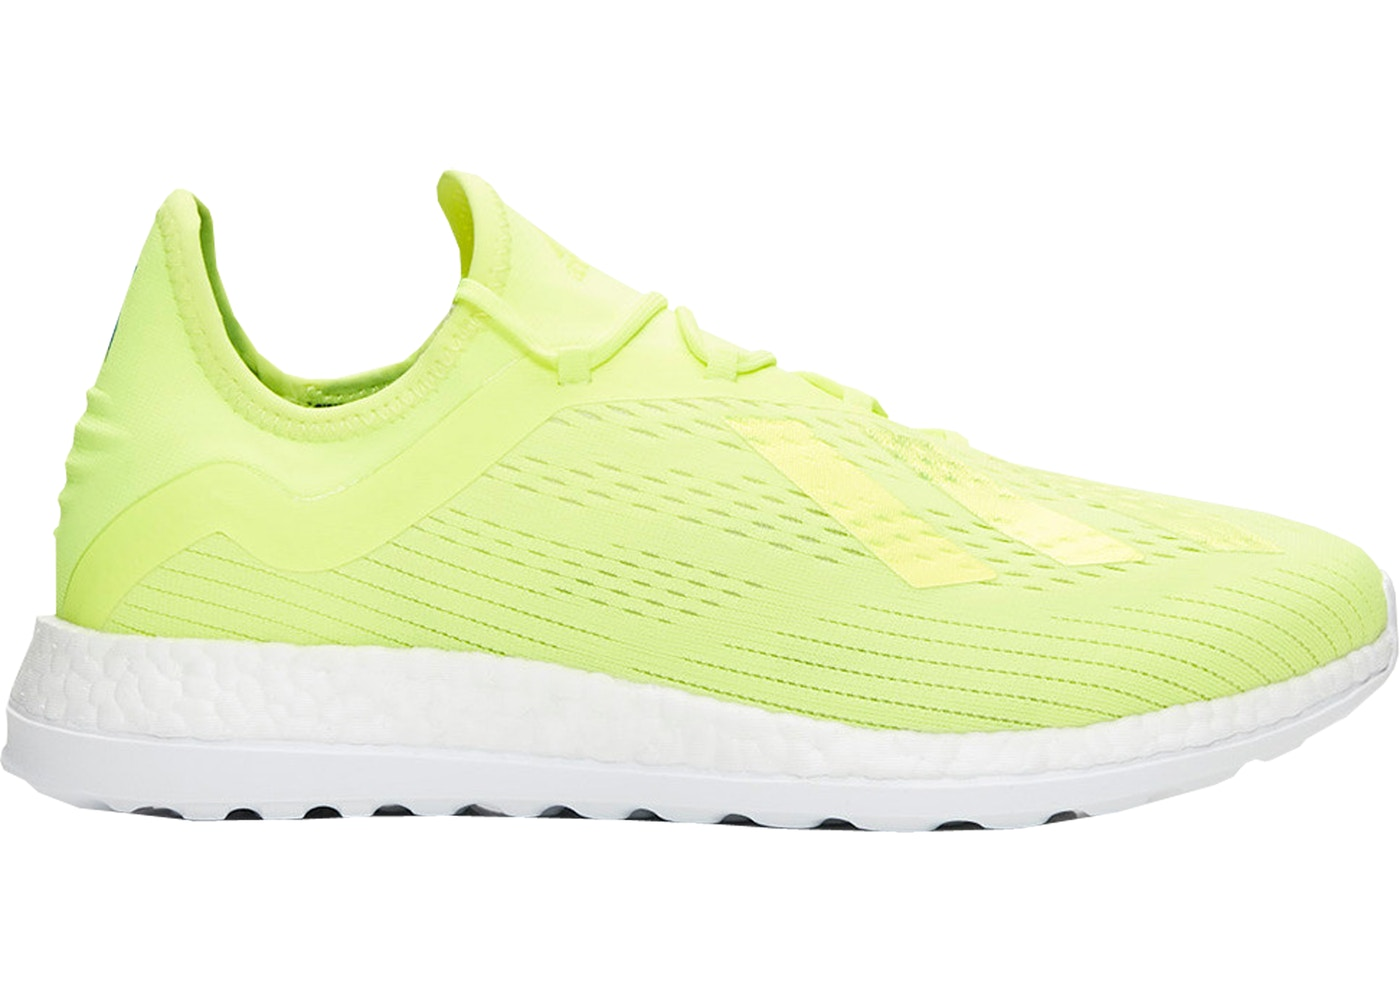 premium selection cc6c4 c9d4f adidas X 18+ TR World Cup 2018 Sonic Yellow